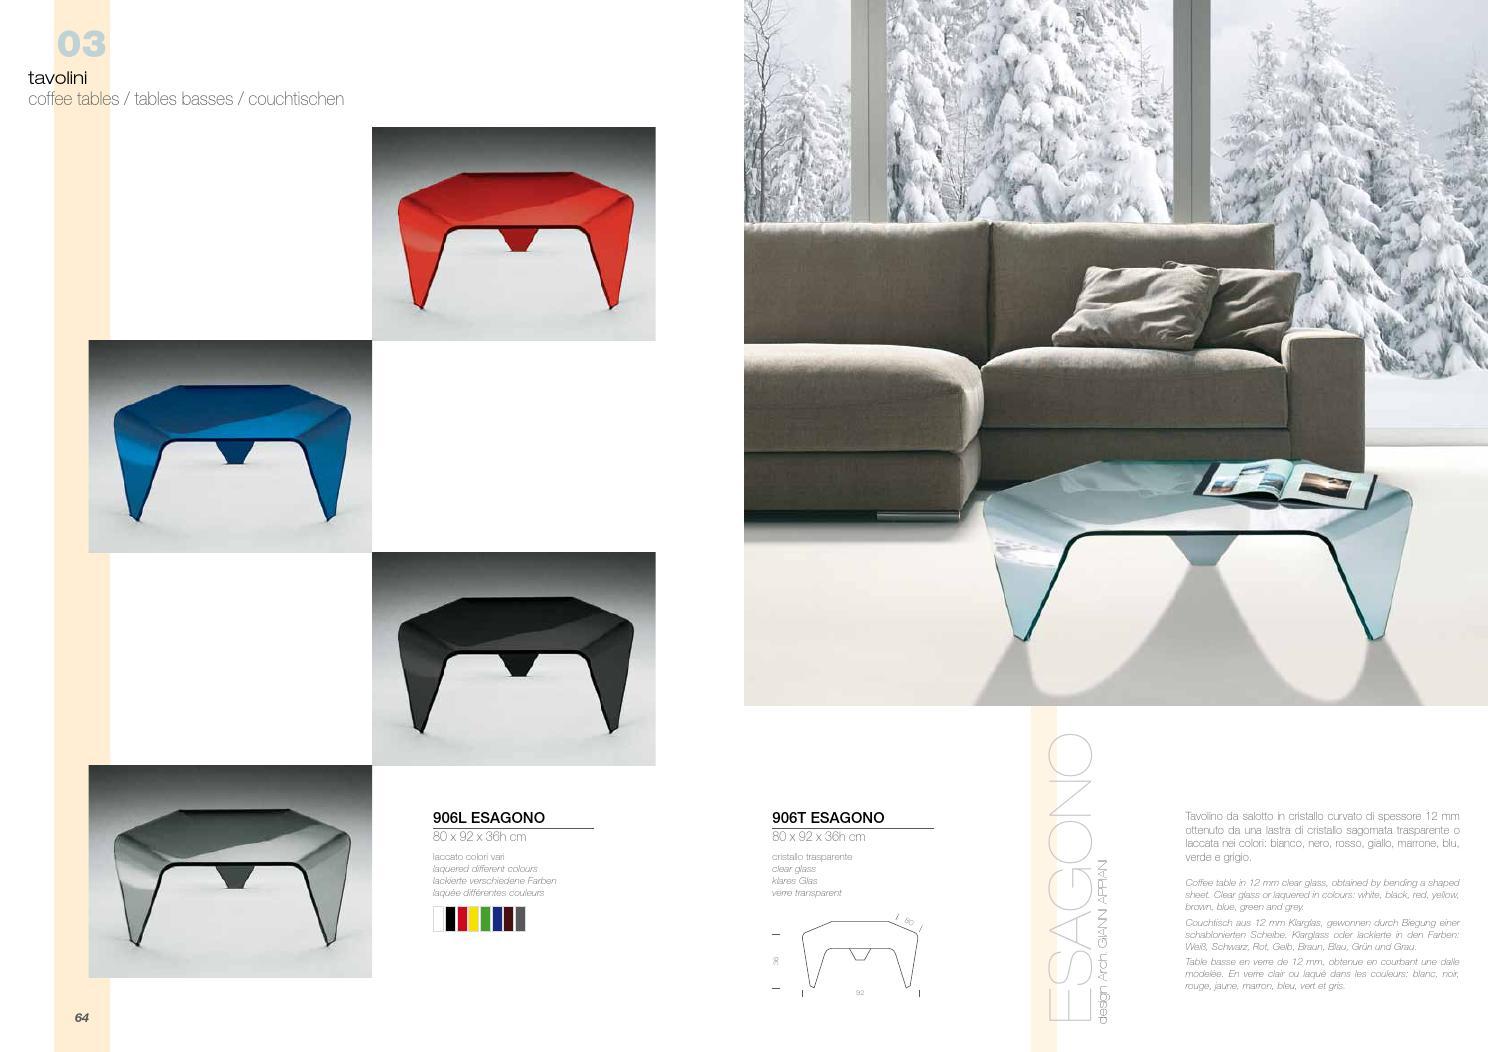 Tavolino Salotto Verde : Tavolino salotto cristallo curvato. best tavolino salotto cristallo